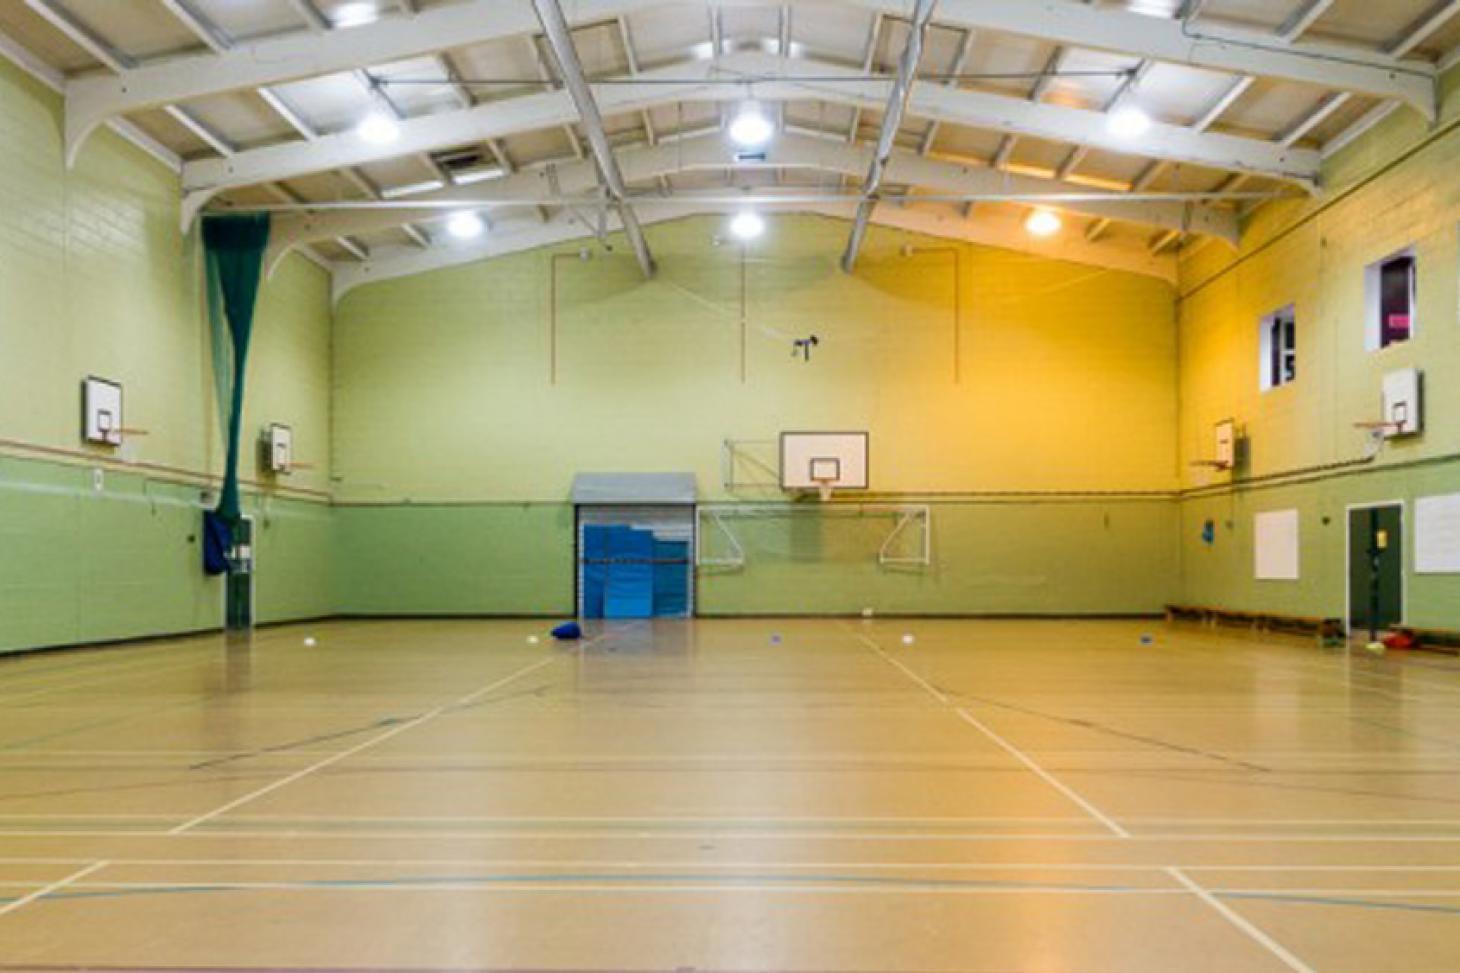 King Harold Business and Enterprise Academy Indoor   Hard badminton court